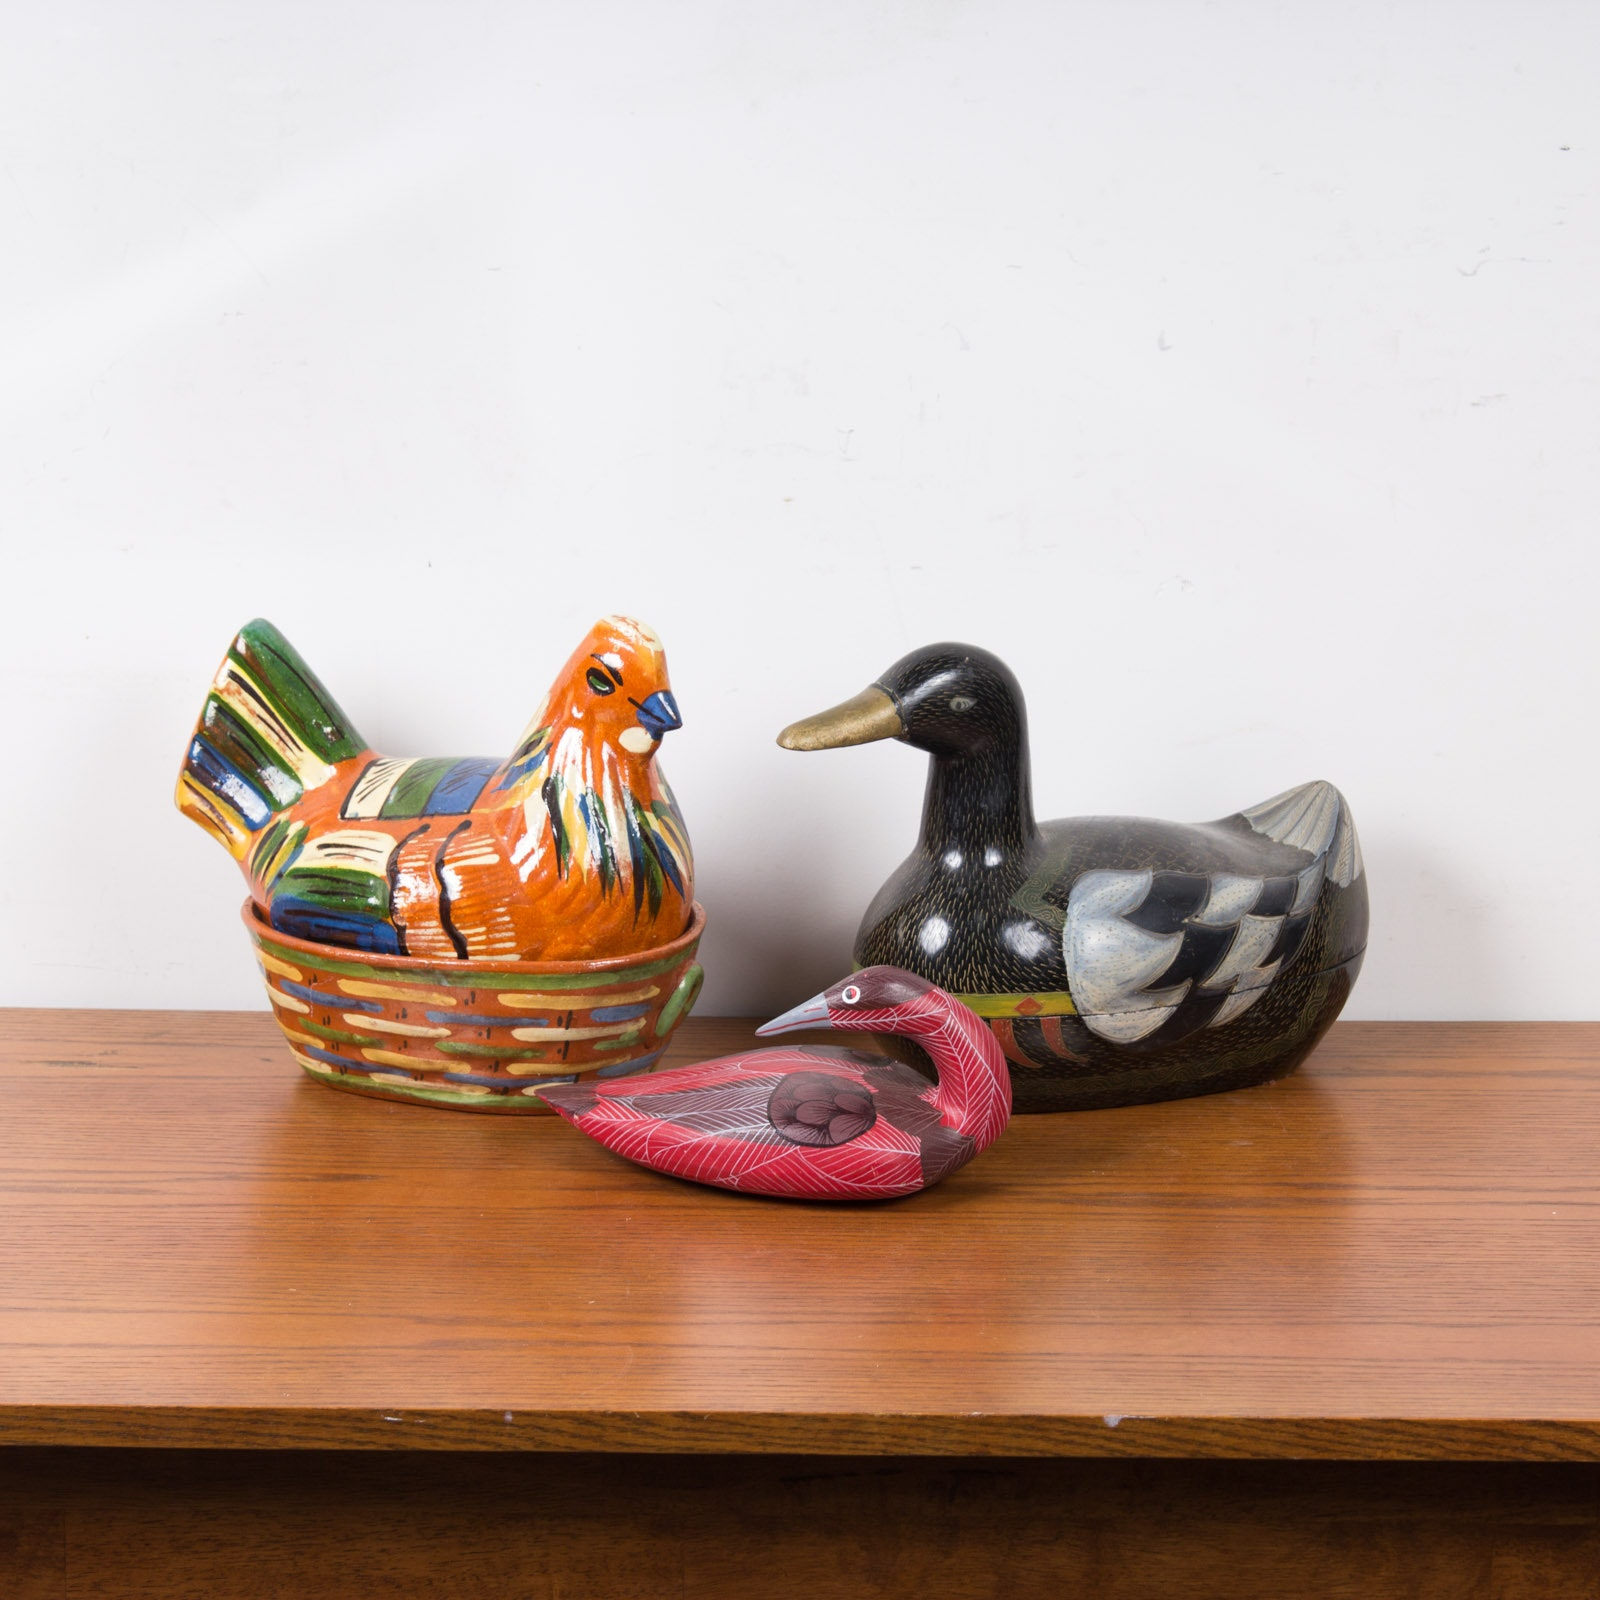 Model home art sale